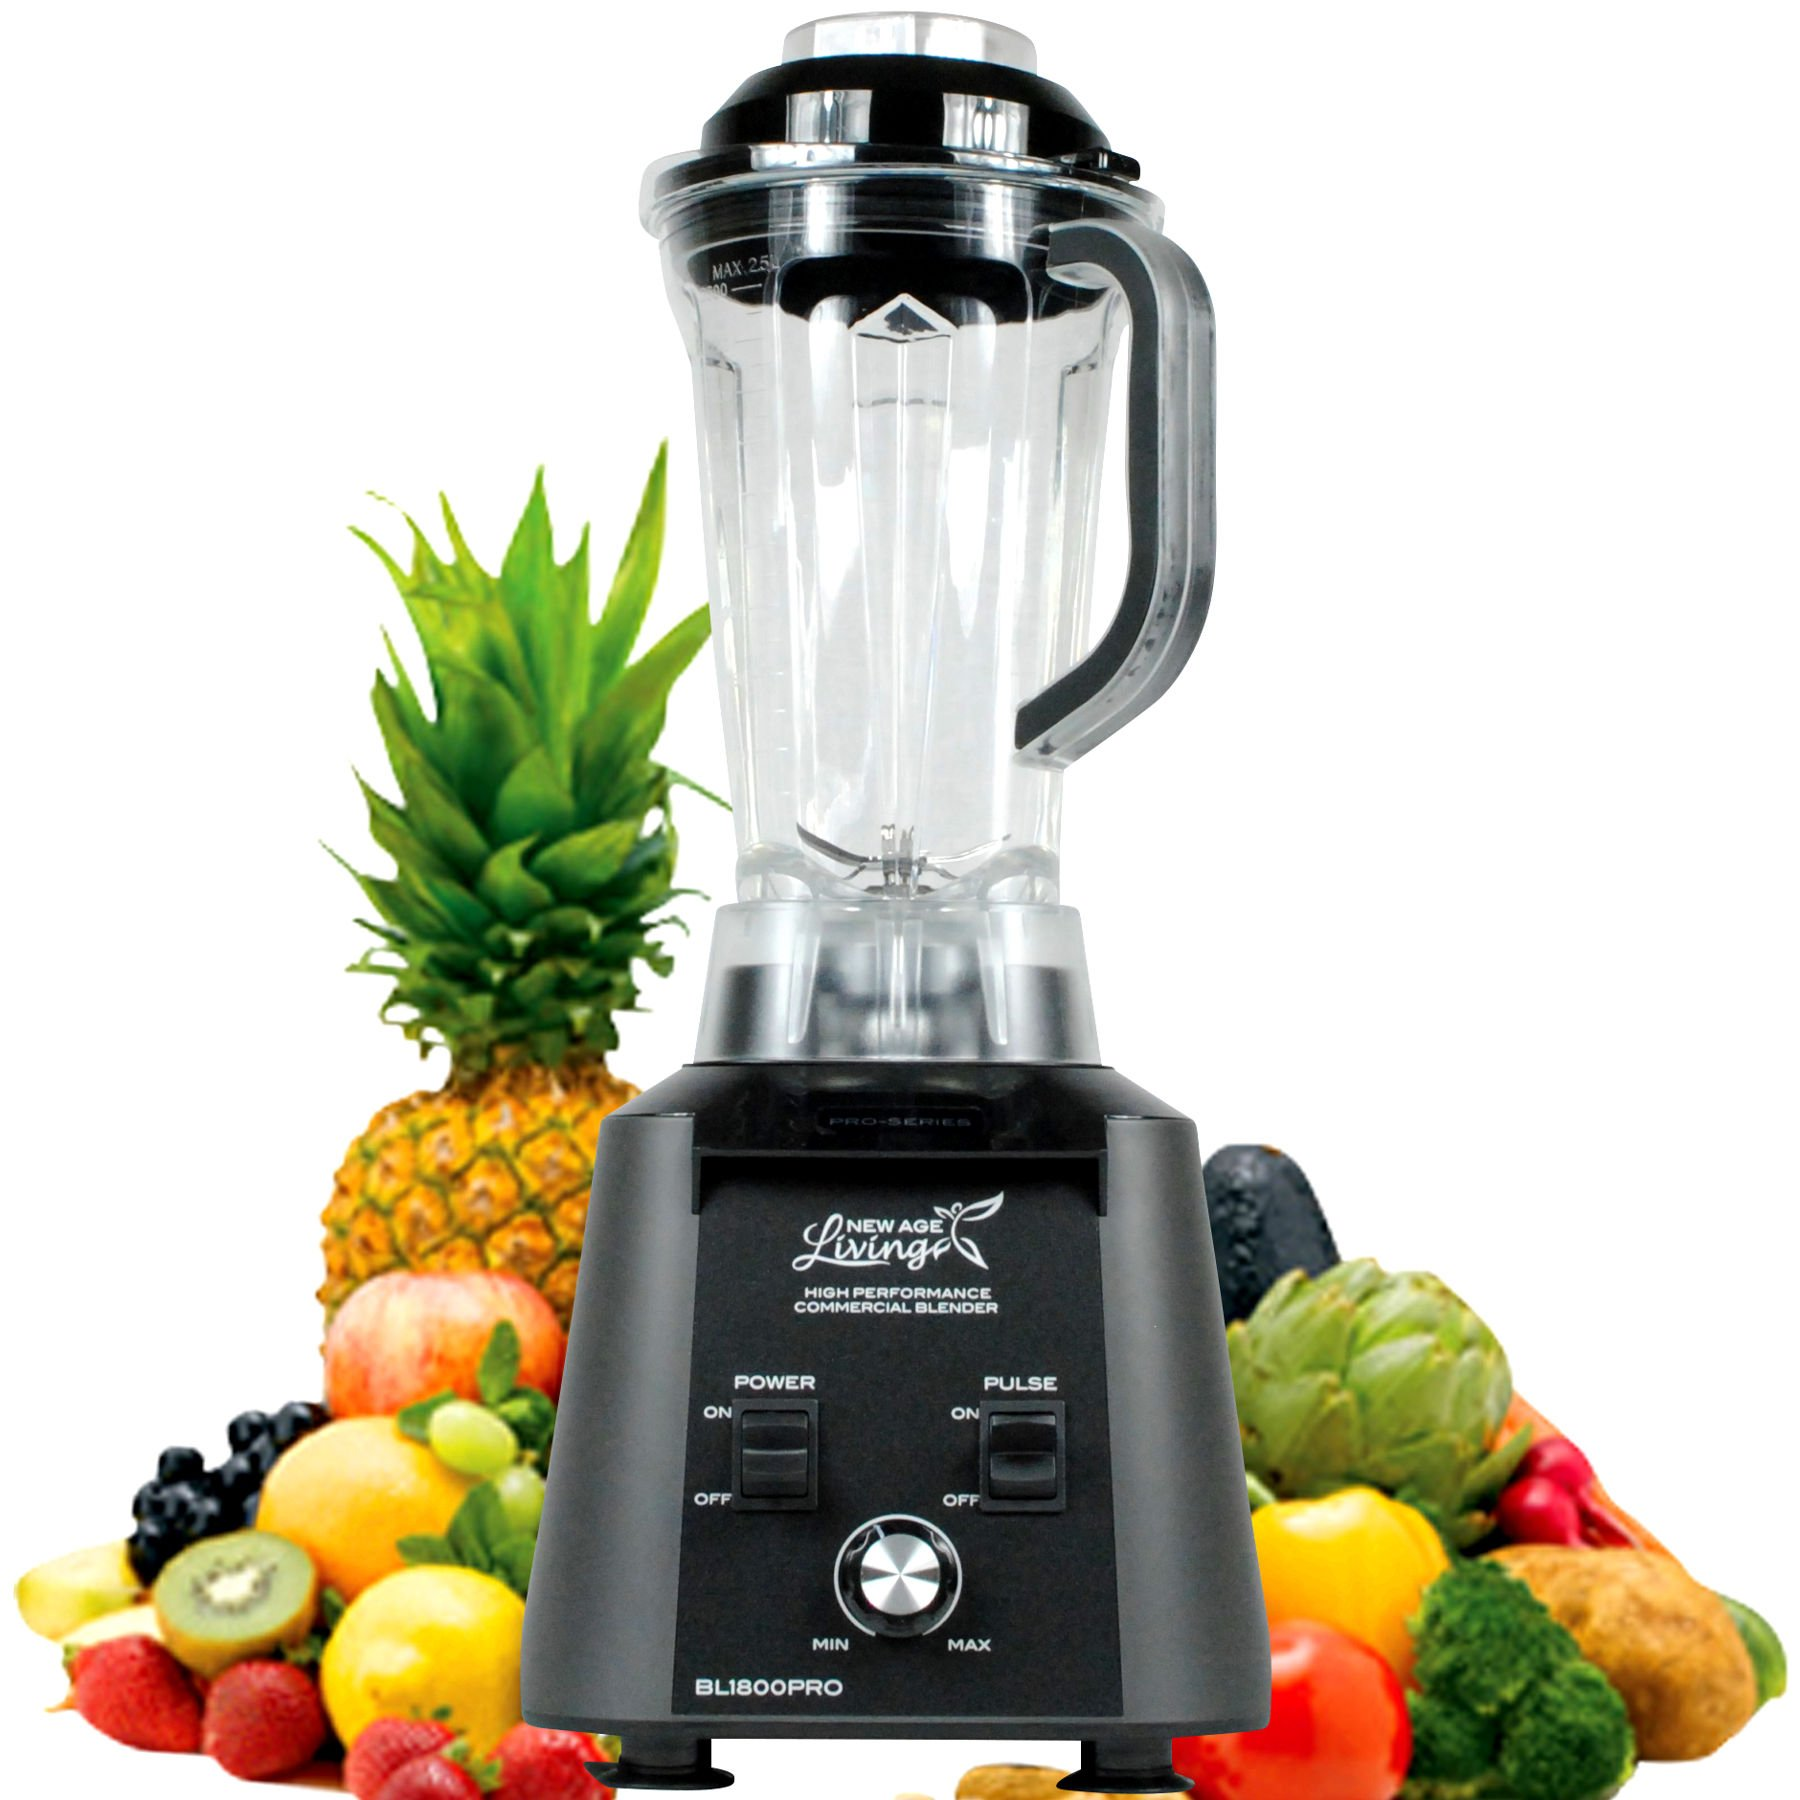 New Age Living BL1800 3.5HP PEAK Smoothie Blender - 5 Year Warranty - ETL Certified - Blends Frozen Fruits, Vegetables, Greens, even Ice - Make Pro Quality Shakes & Soups